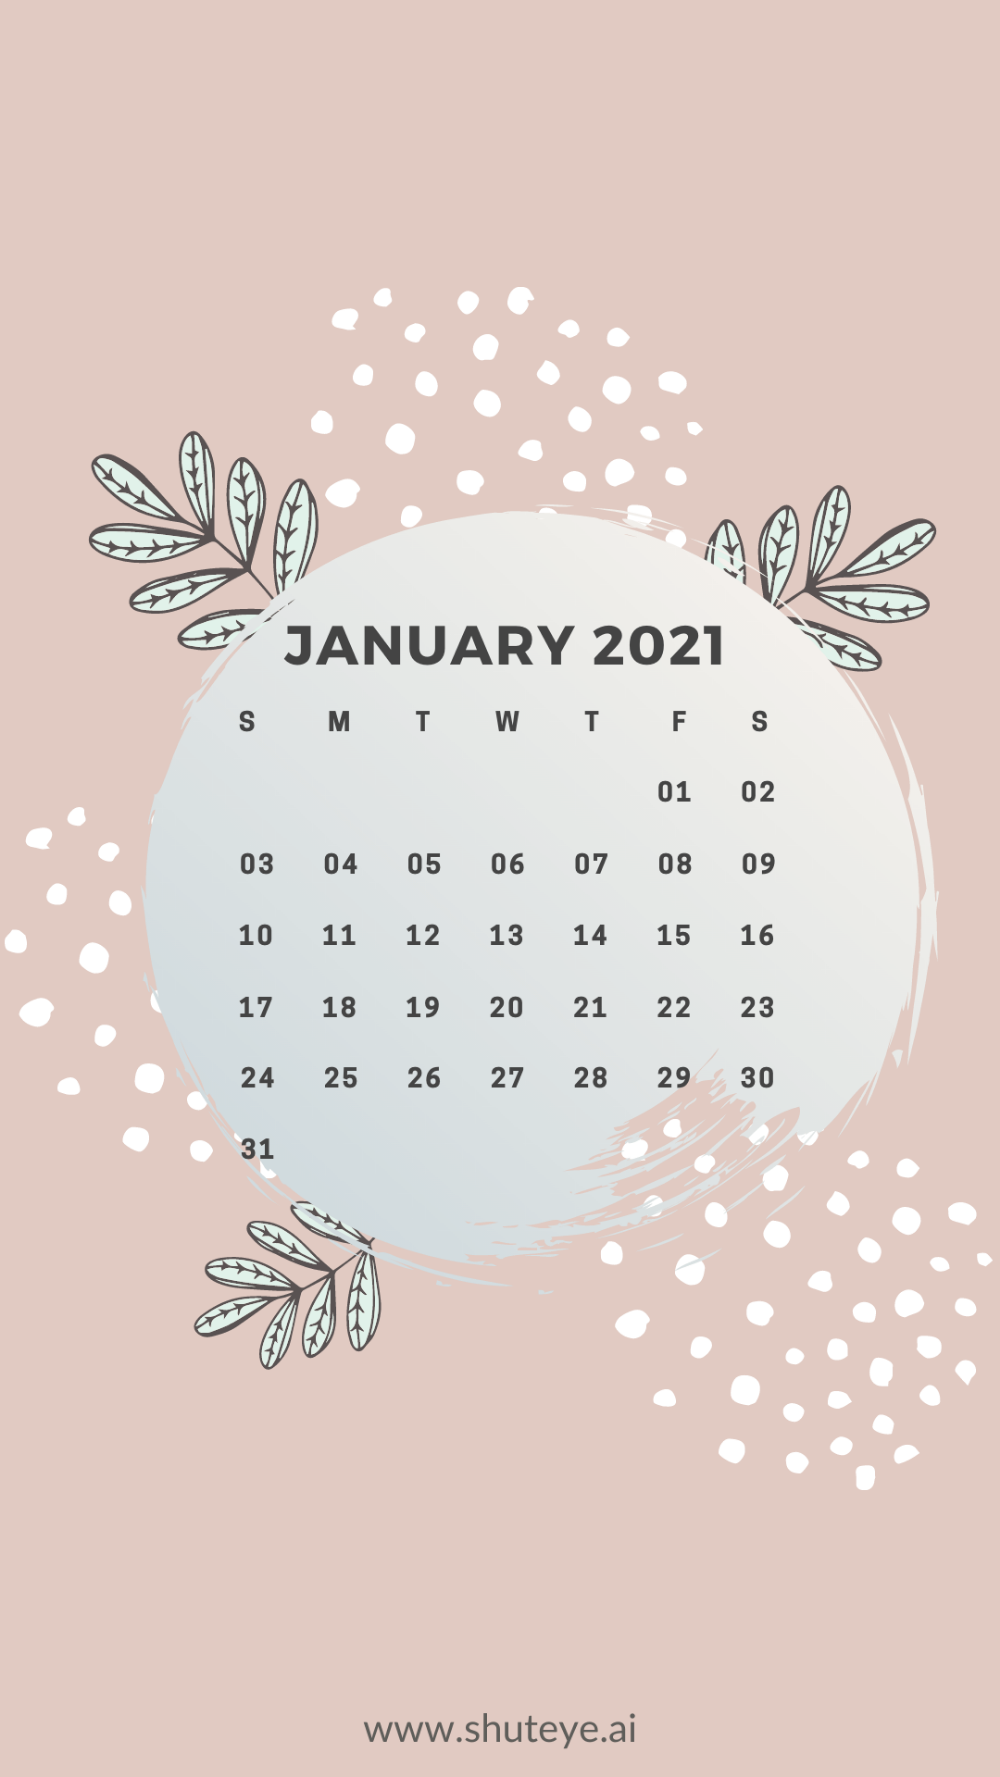 January 2021 Calendar Shuteye January Calendar Calendar Wallpaper January Wallpaper